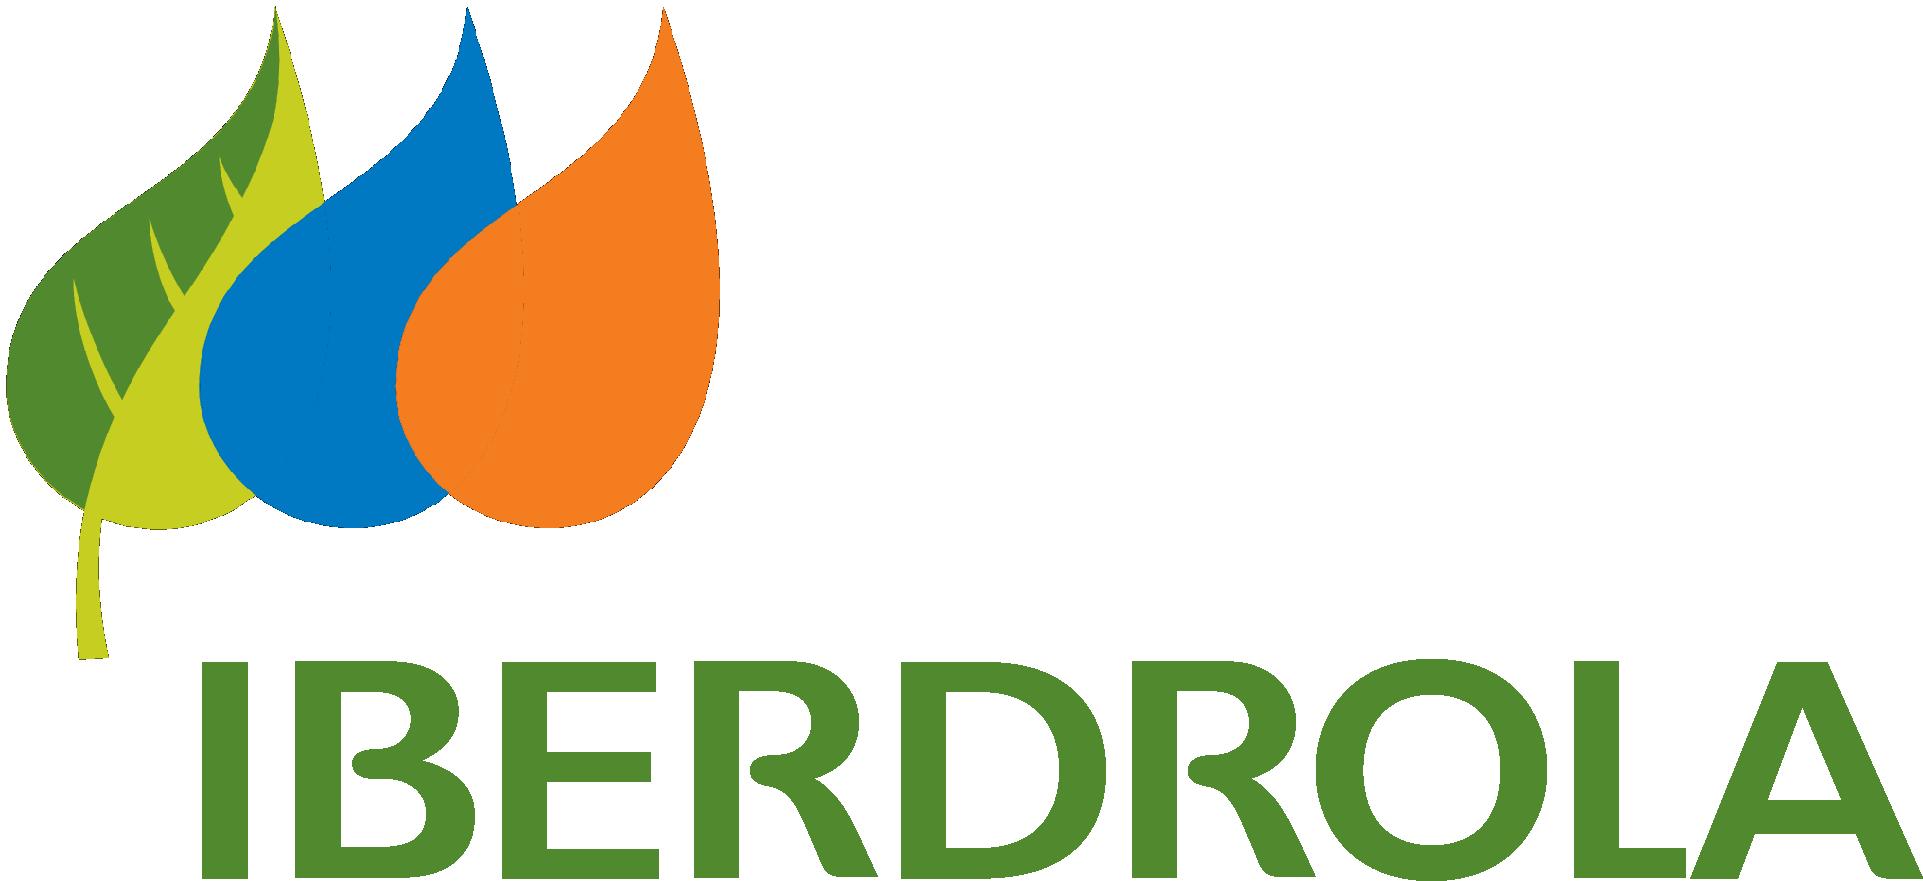 Charge card logo of Iberdrola